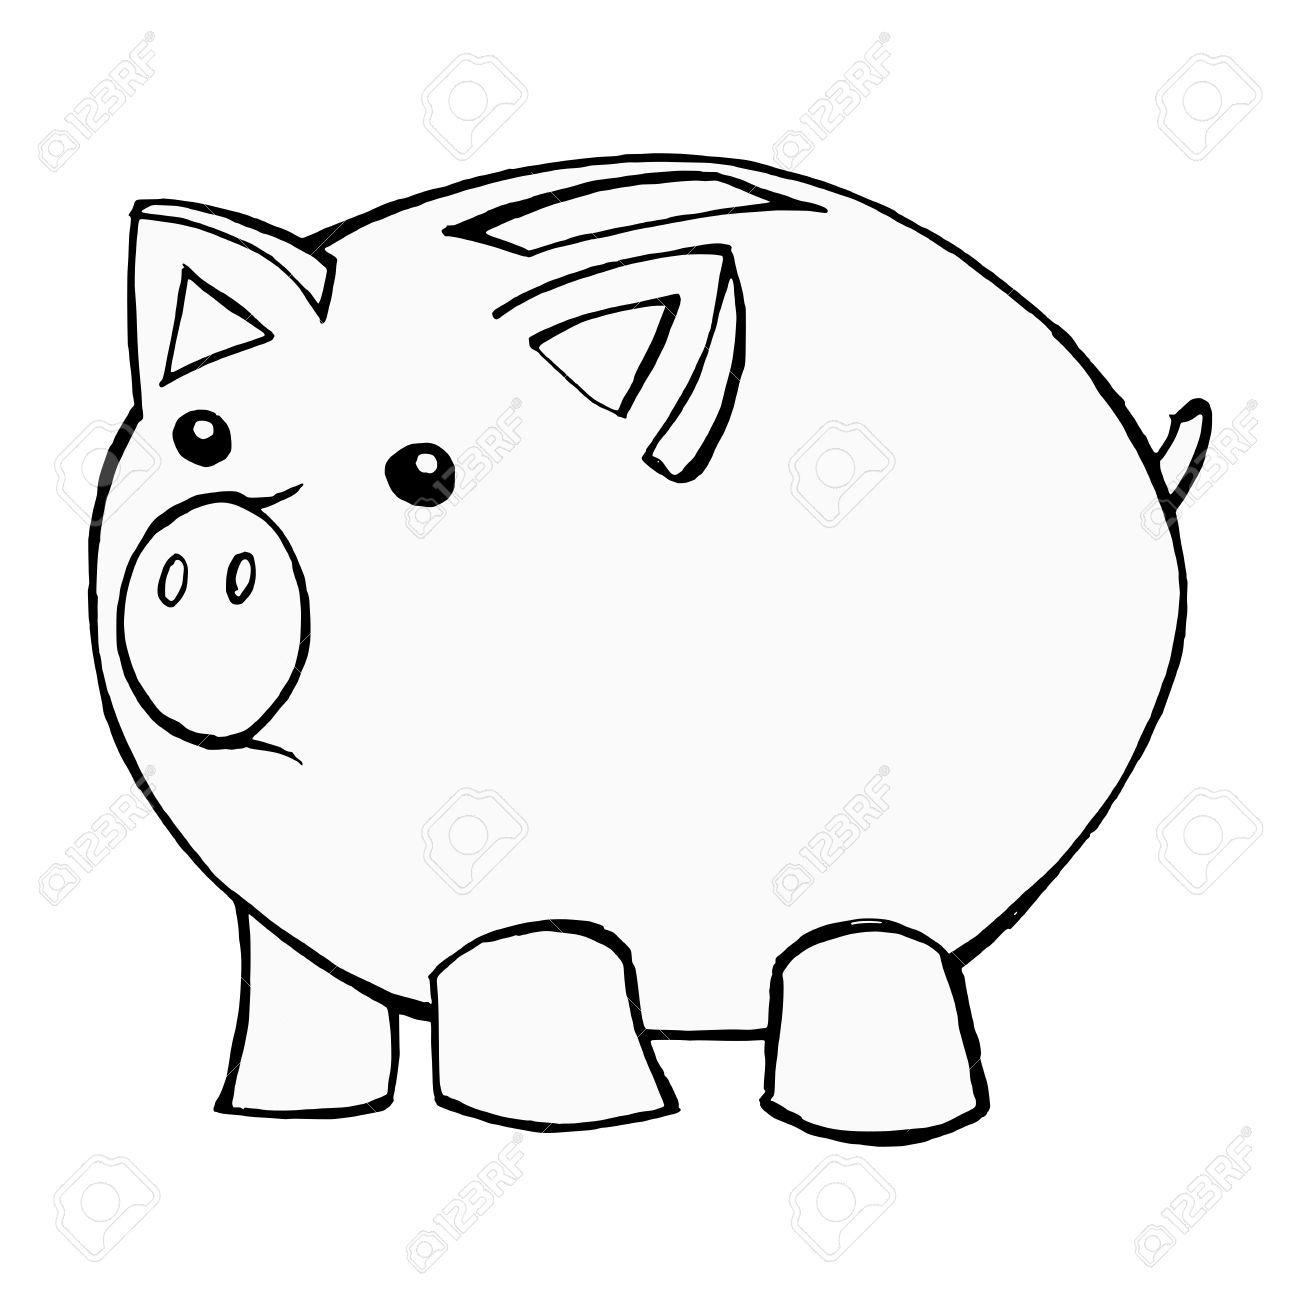 1300x1300 Hand Drawn, Cartoon, Illustration Of Piggy Bank Royalty Free